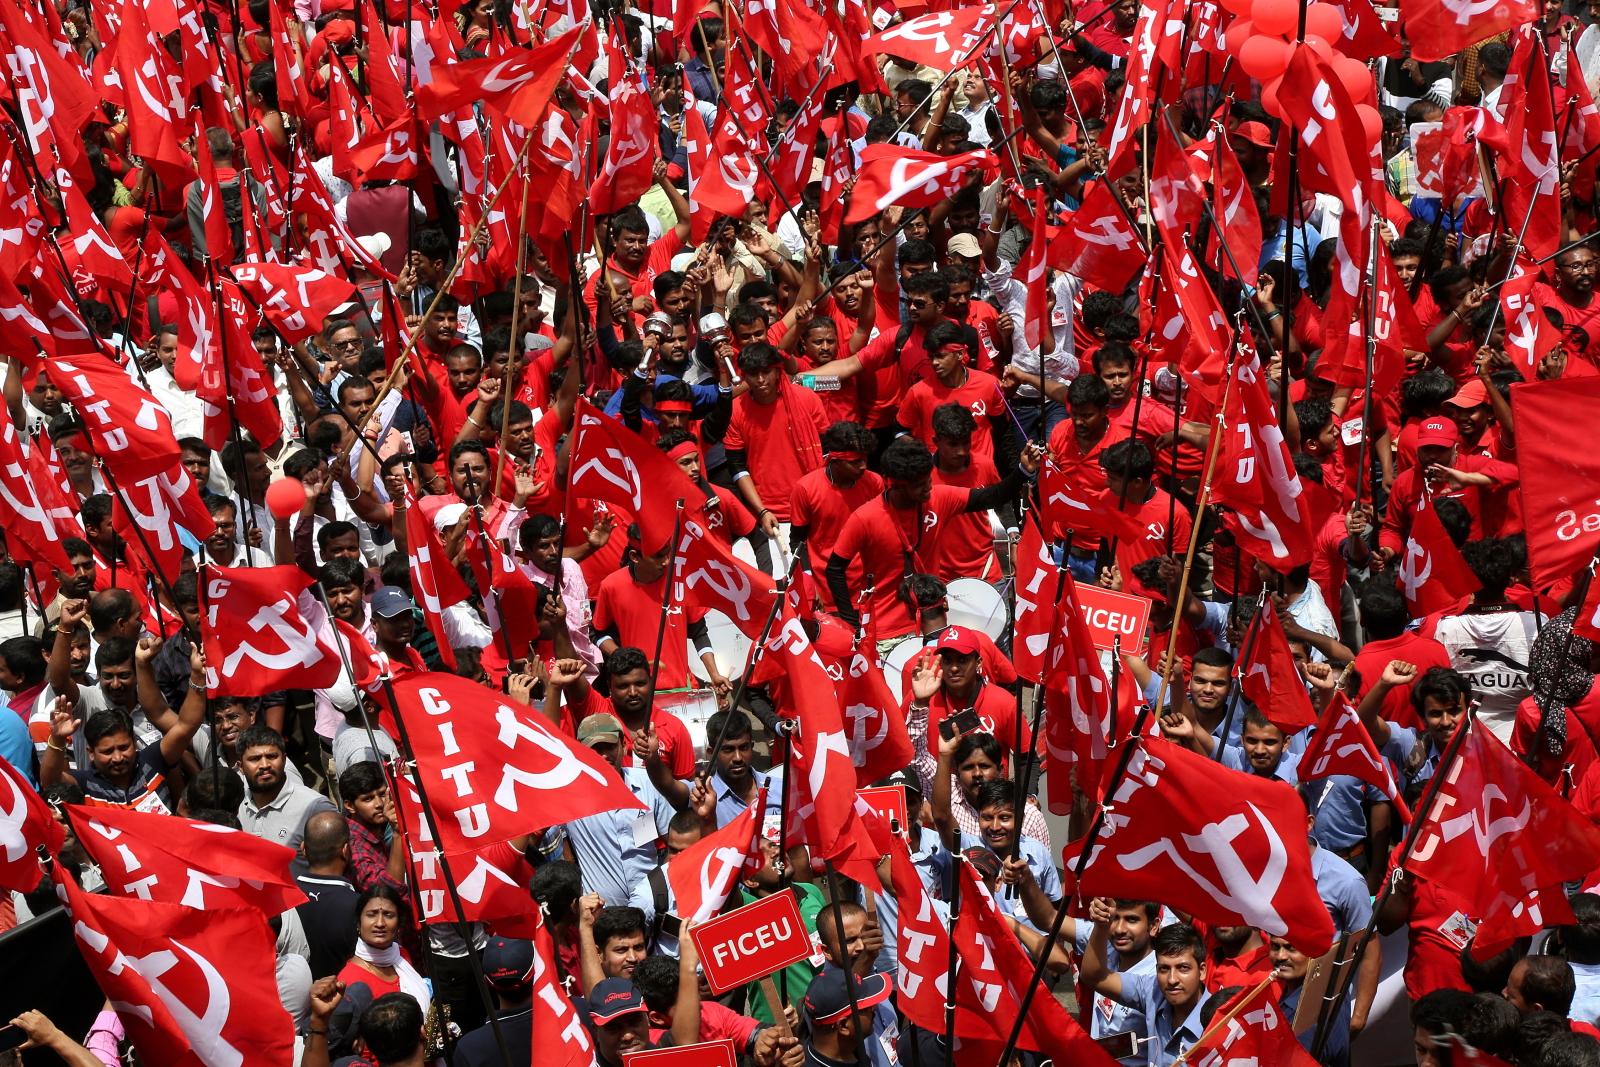 Święto Pracy w Indiach  EPA/JAGADEESH NV